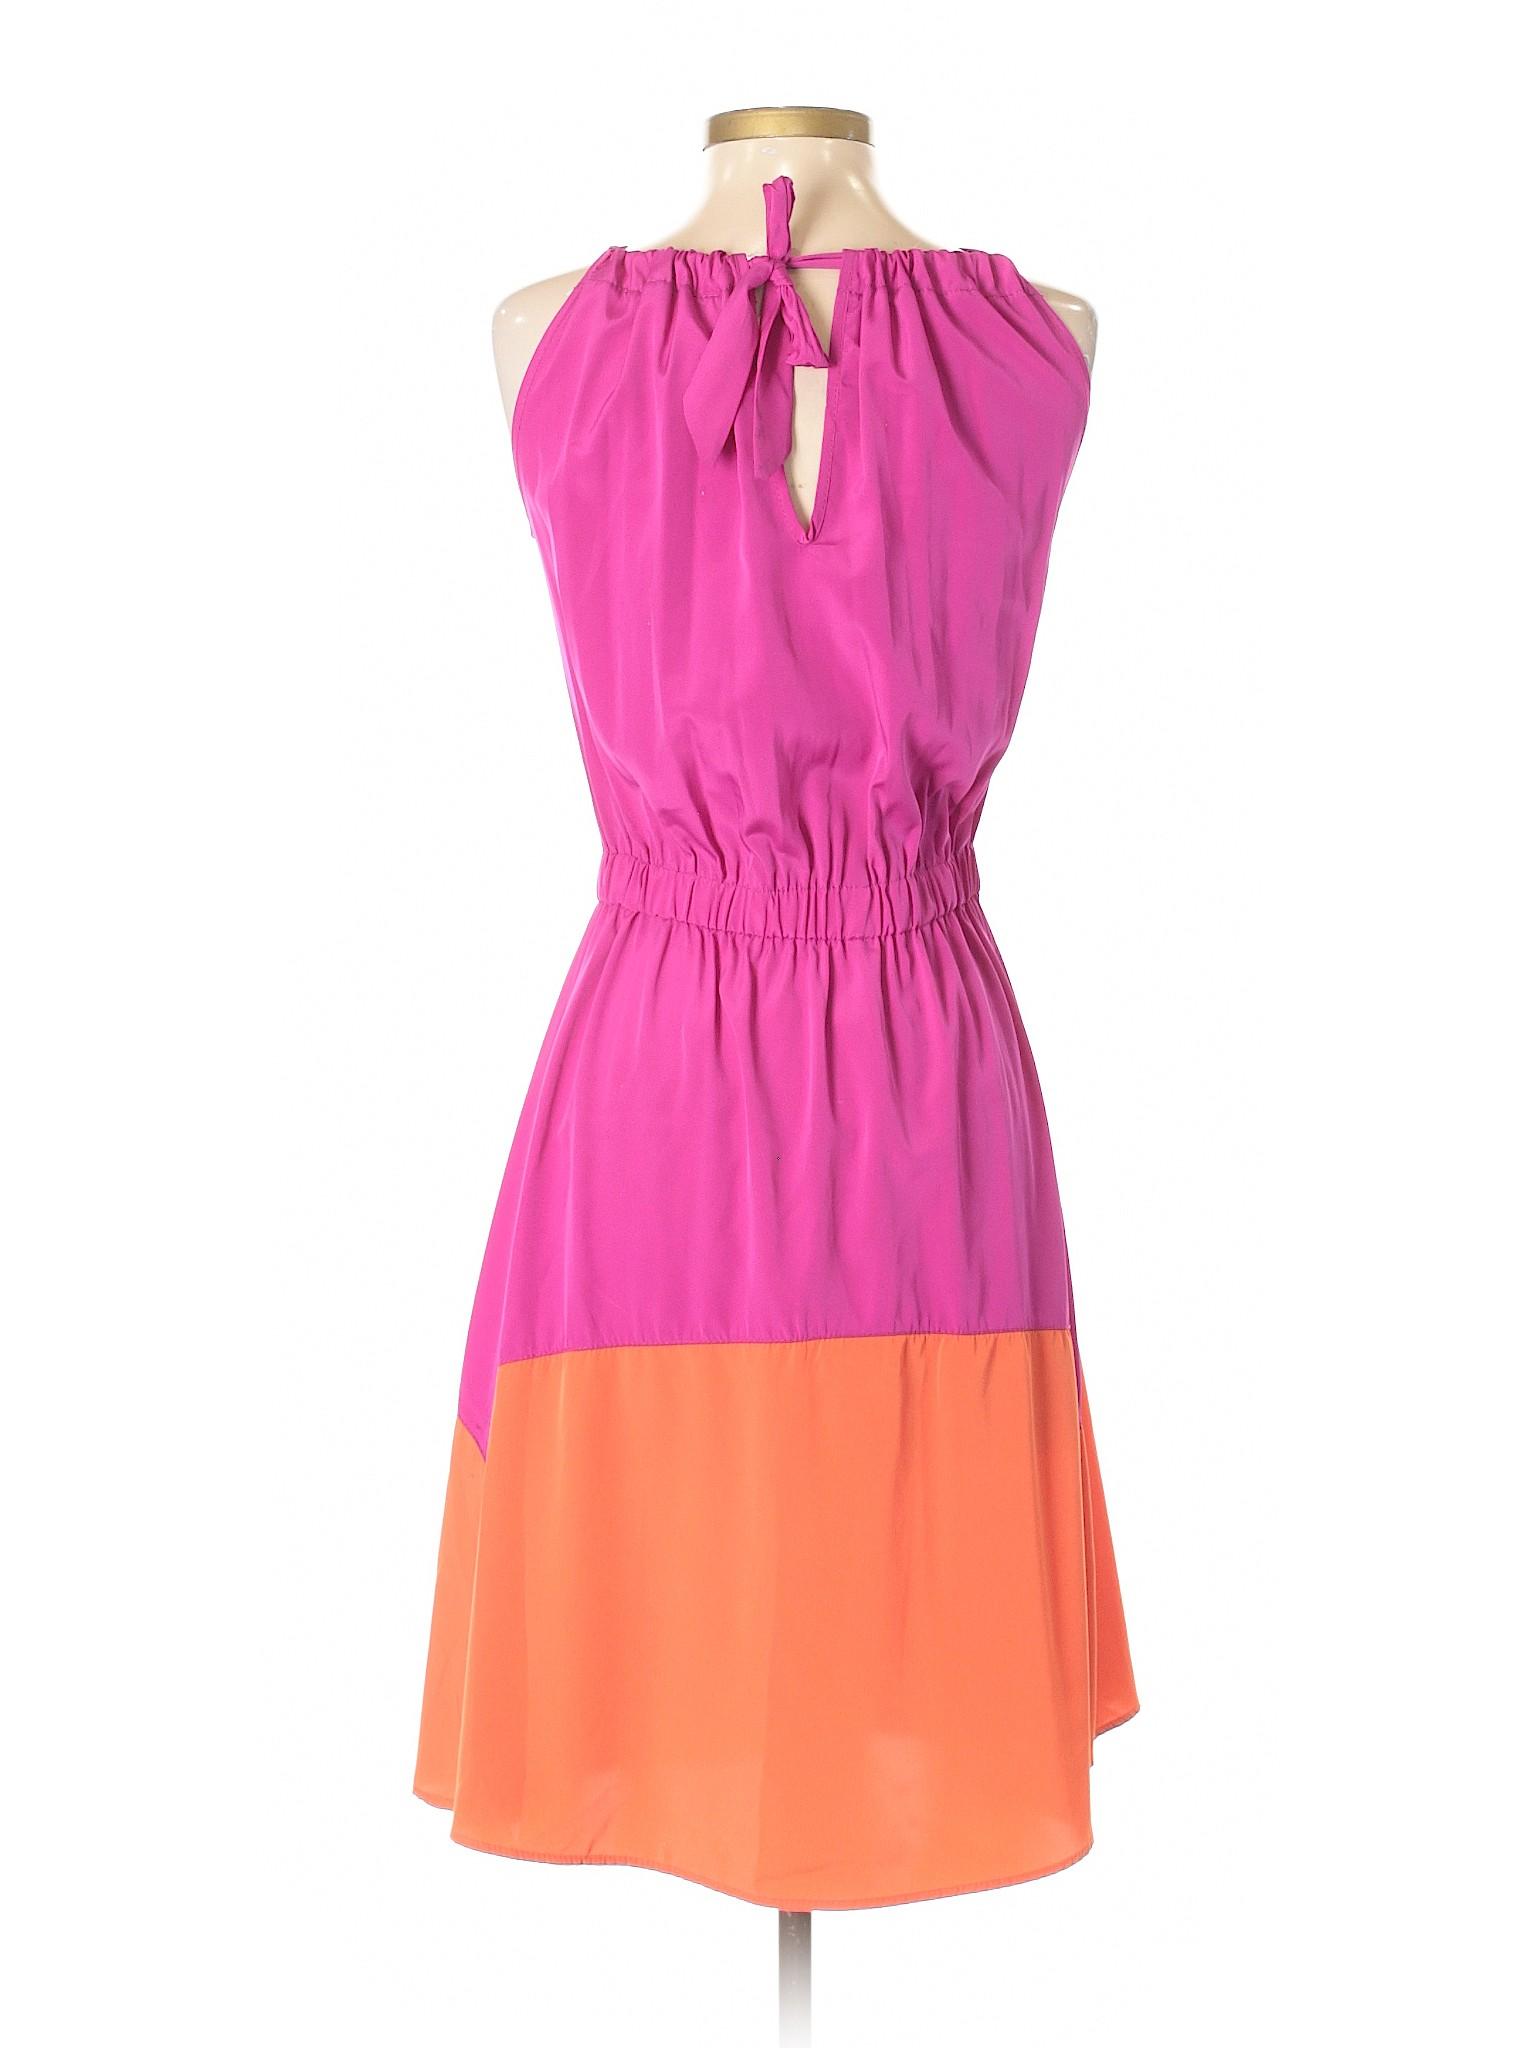 Dress Francesca's Francesca's Selling Selling Casual Dress Casual Selling Dress Francesca's Casual v6F14qO